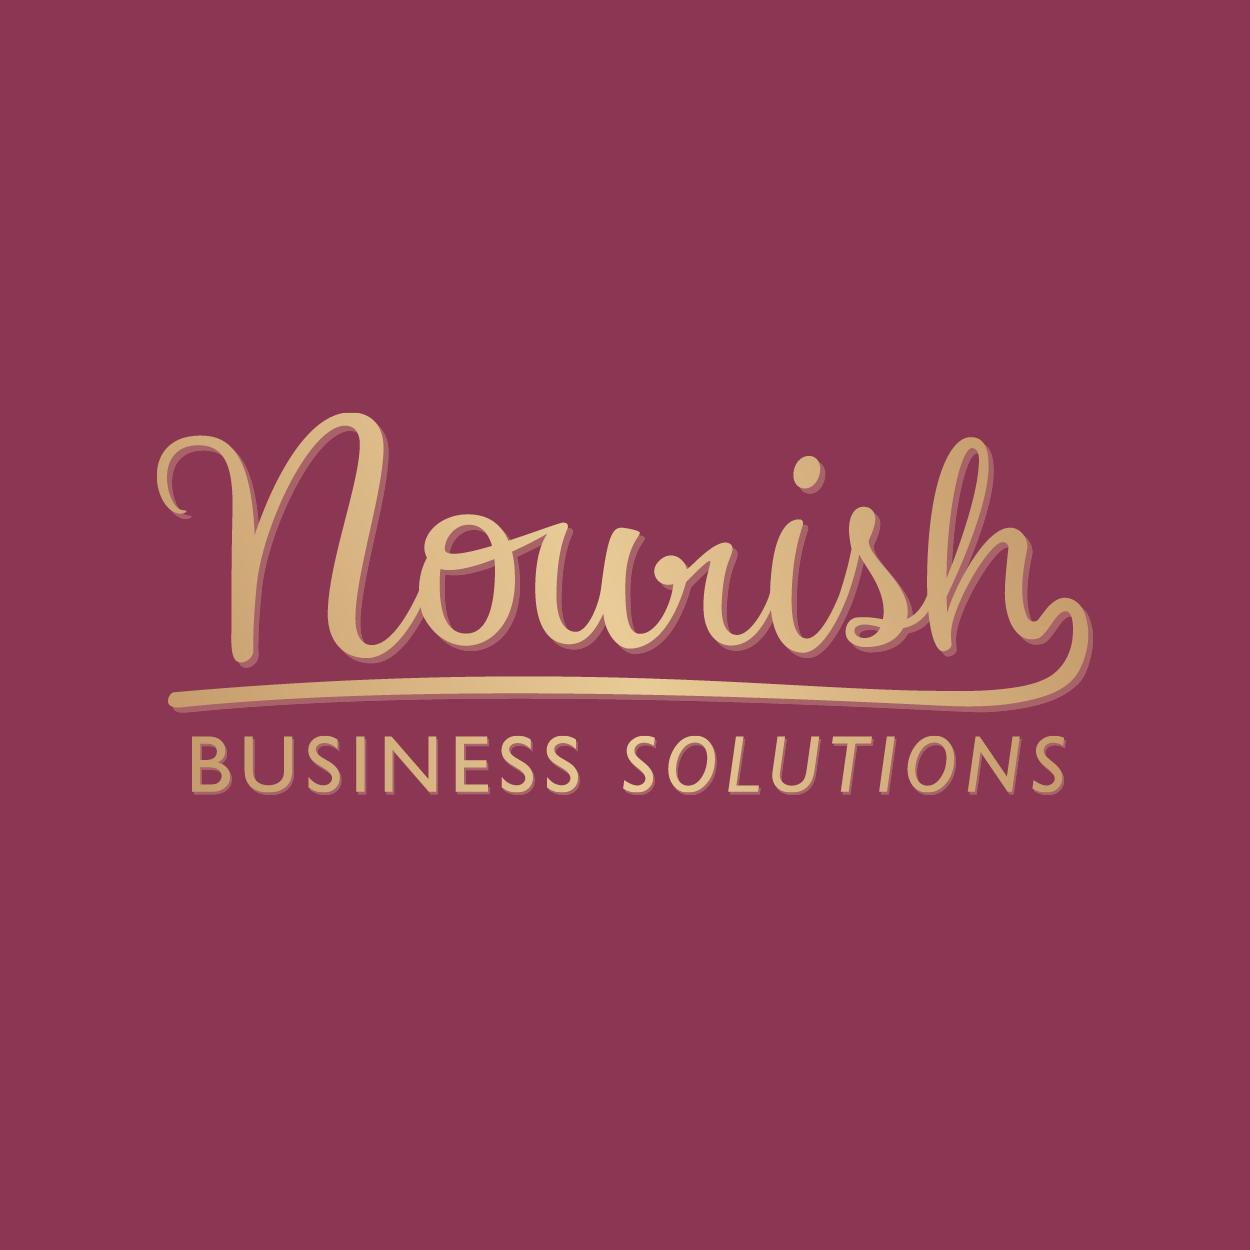 Nourish Business Solutions - Kira Hyde Creative